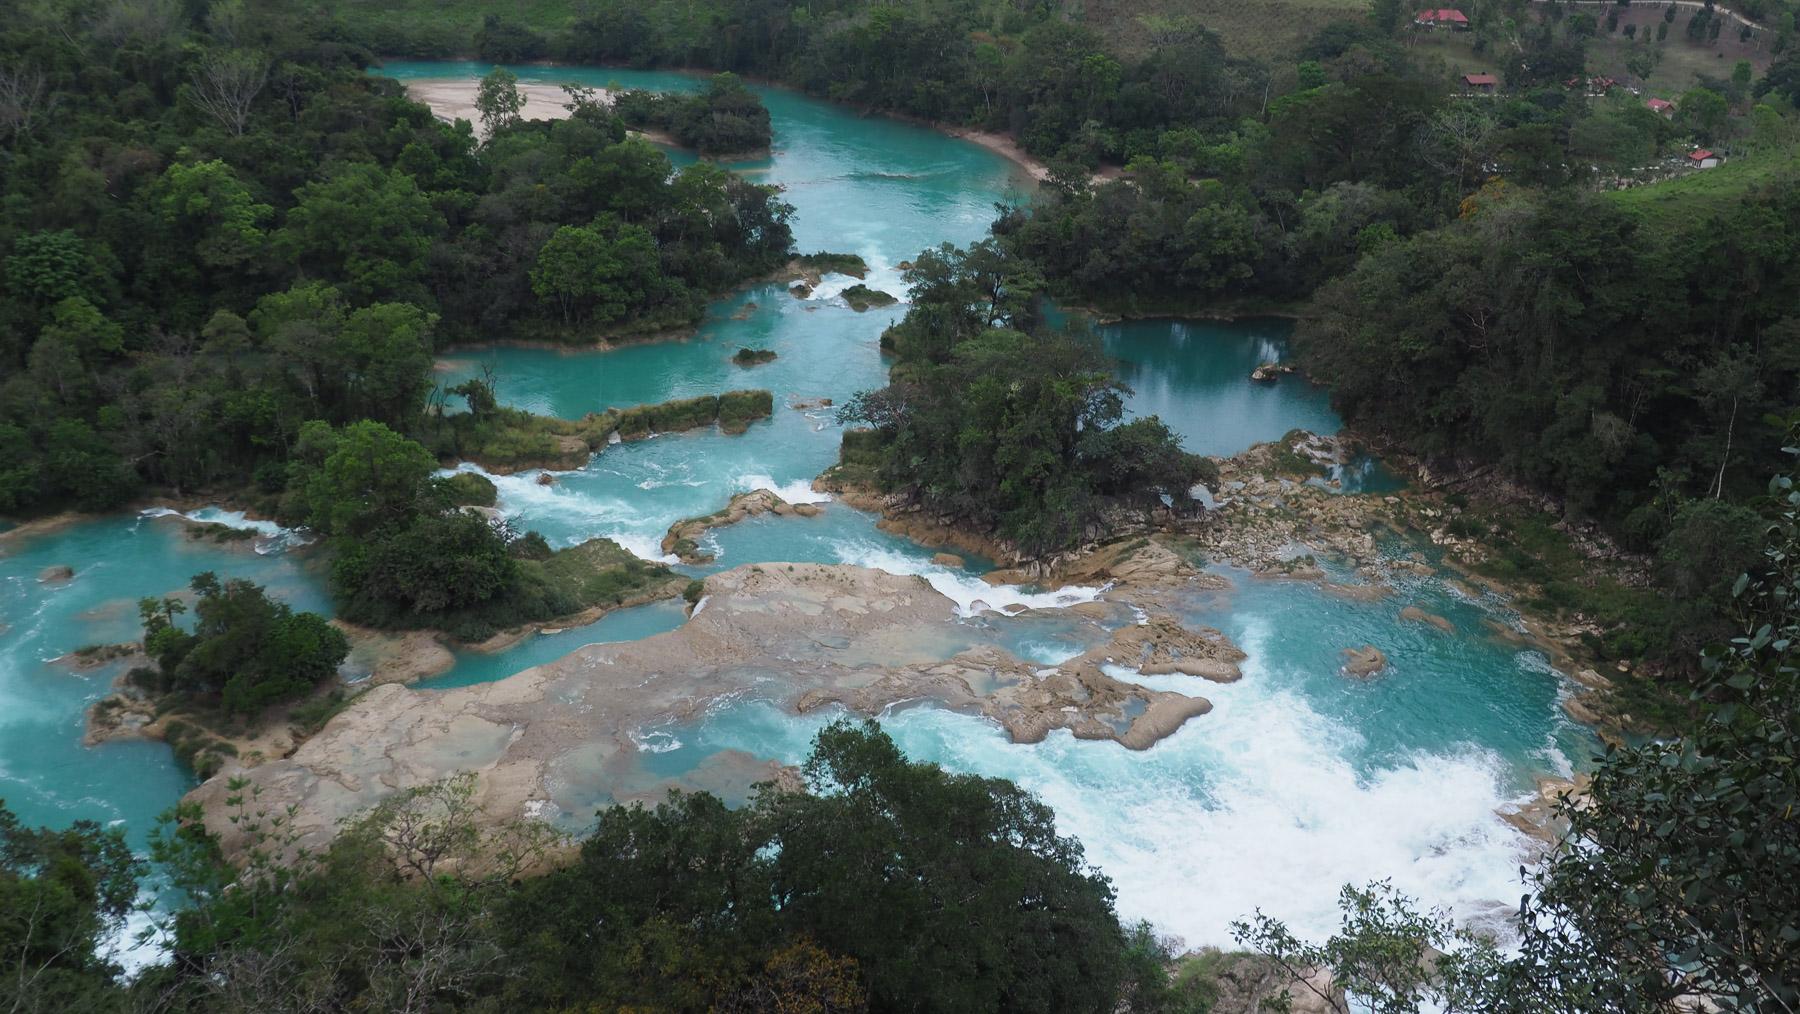 Wunderschöne türkisblaue Flüsse in Chiapas